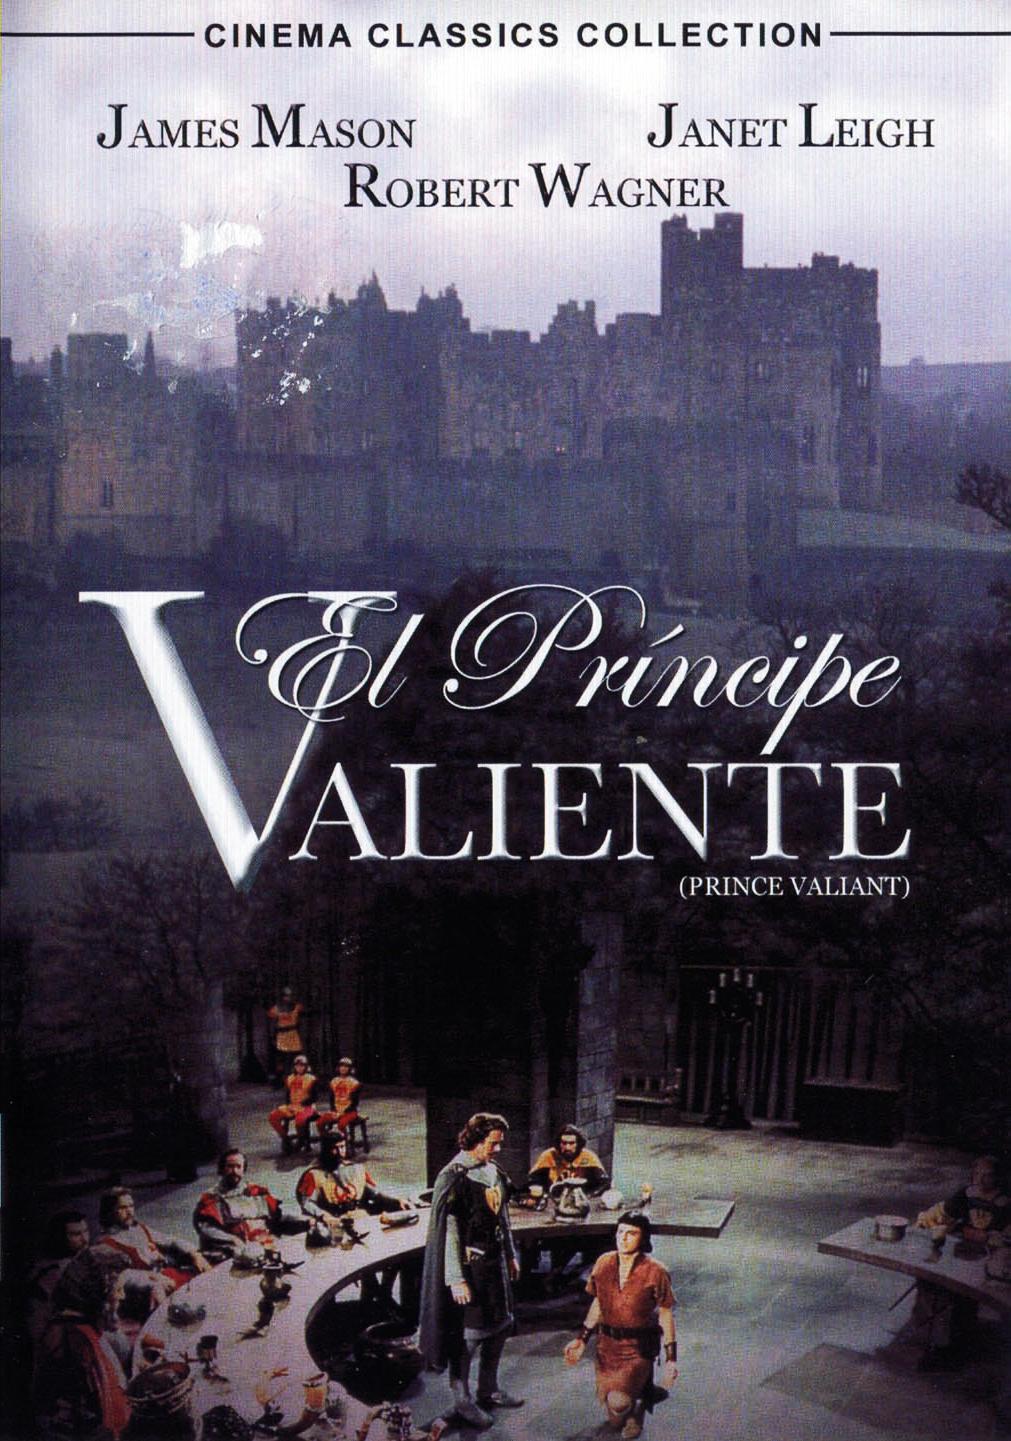 Принц Валиант - Prince Valiant